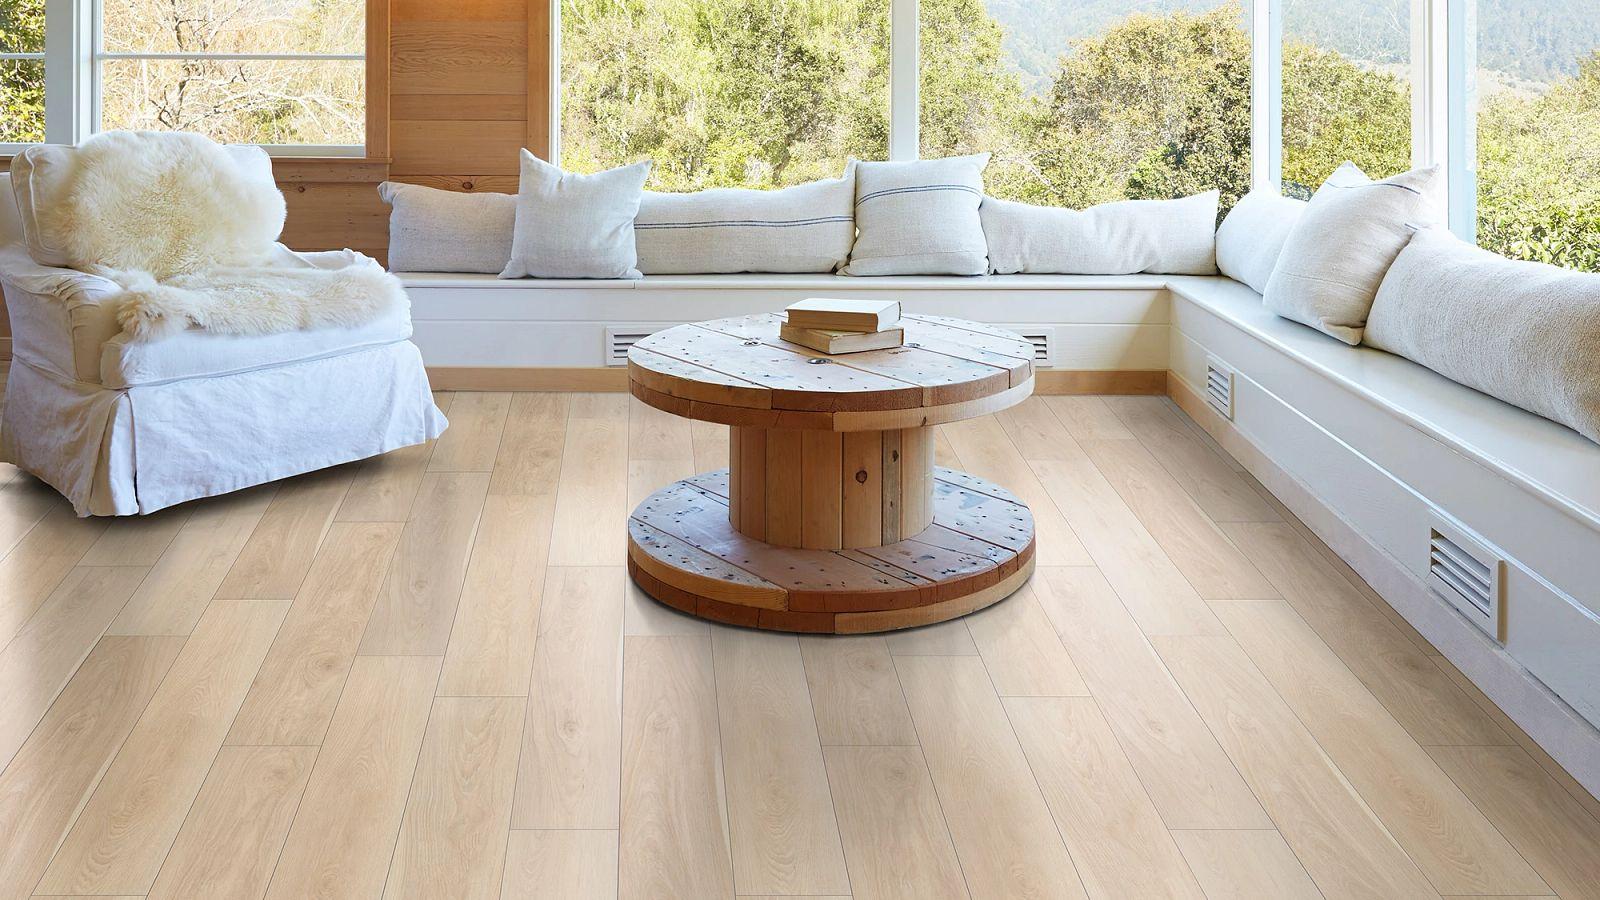 Resilient Vinyl Flooring Plank, Resilient Laminate Flooring